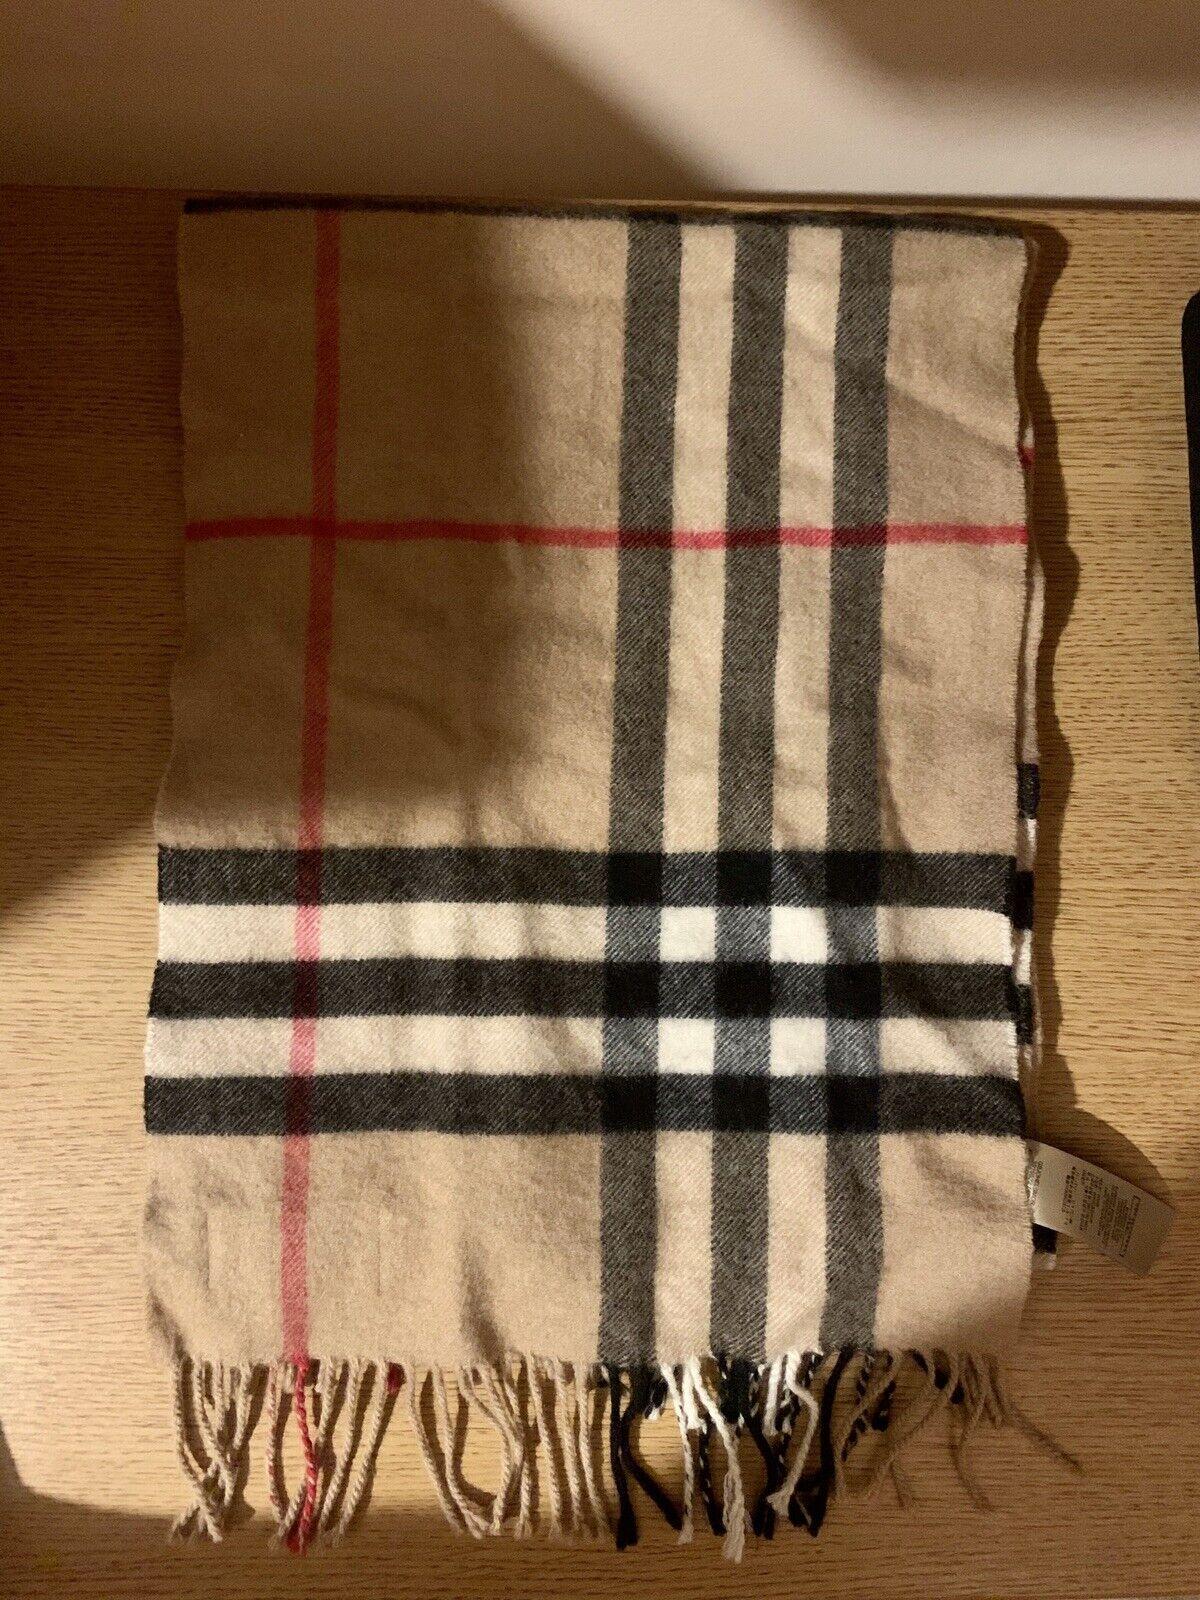 Authentic Burberry Scarf : authentic, burberry, scarf, Authentic, Burberry, Scarf